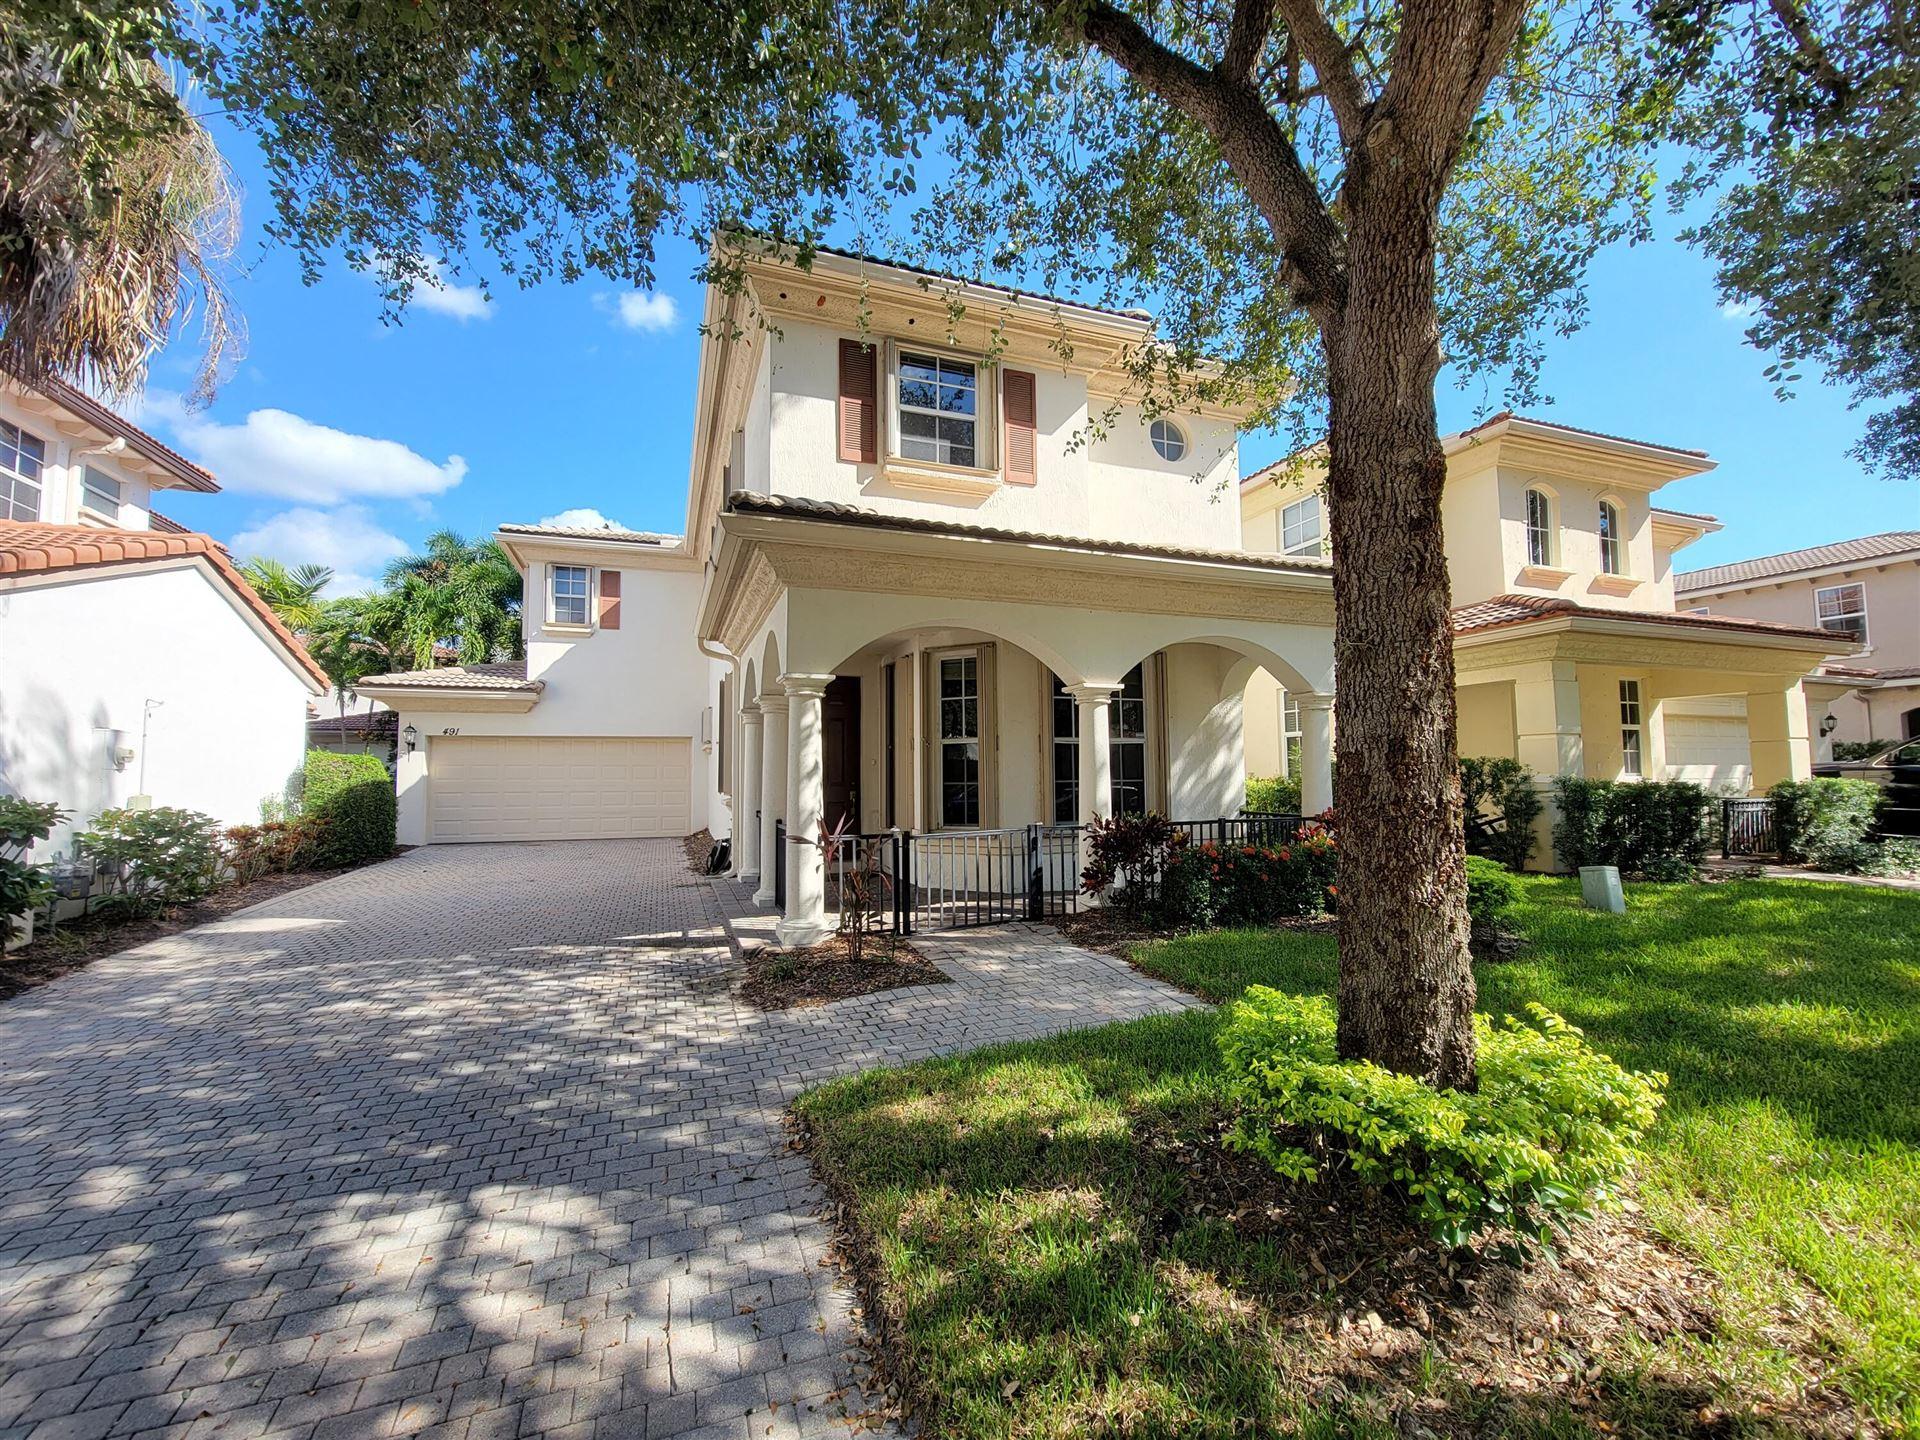 Photo of 491 Leaf Drive, Palm Beach Gardens, FL 33410 (MLS # RX-10746697)